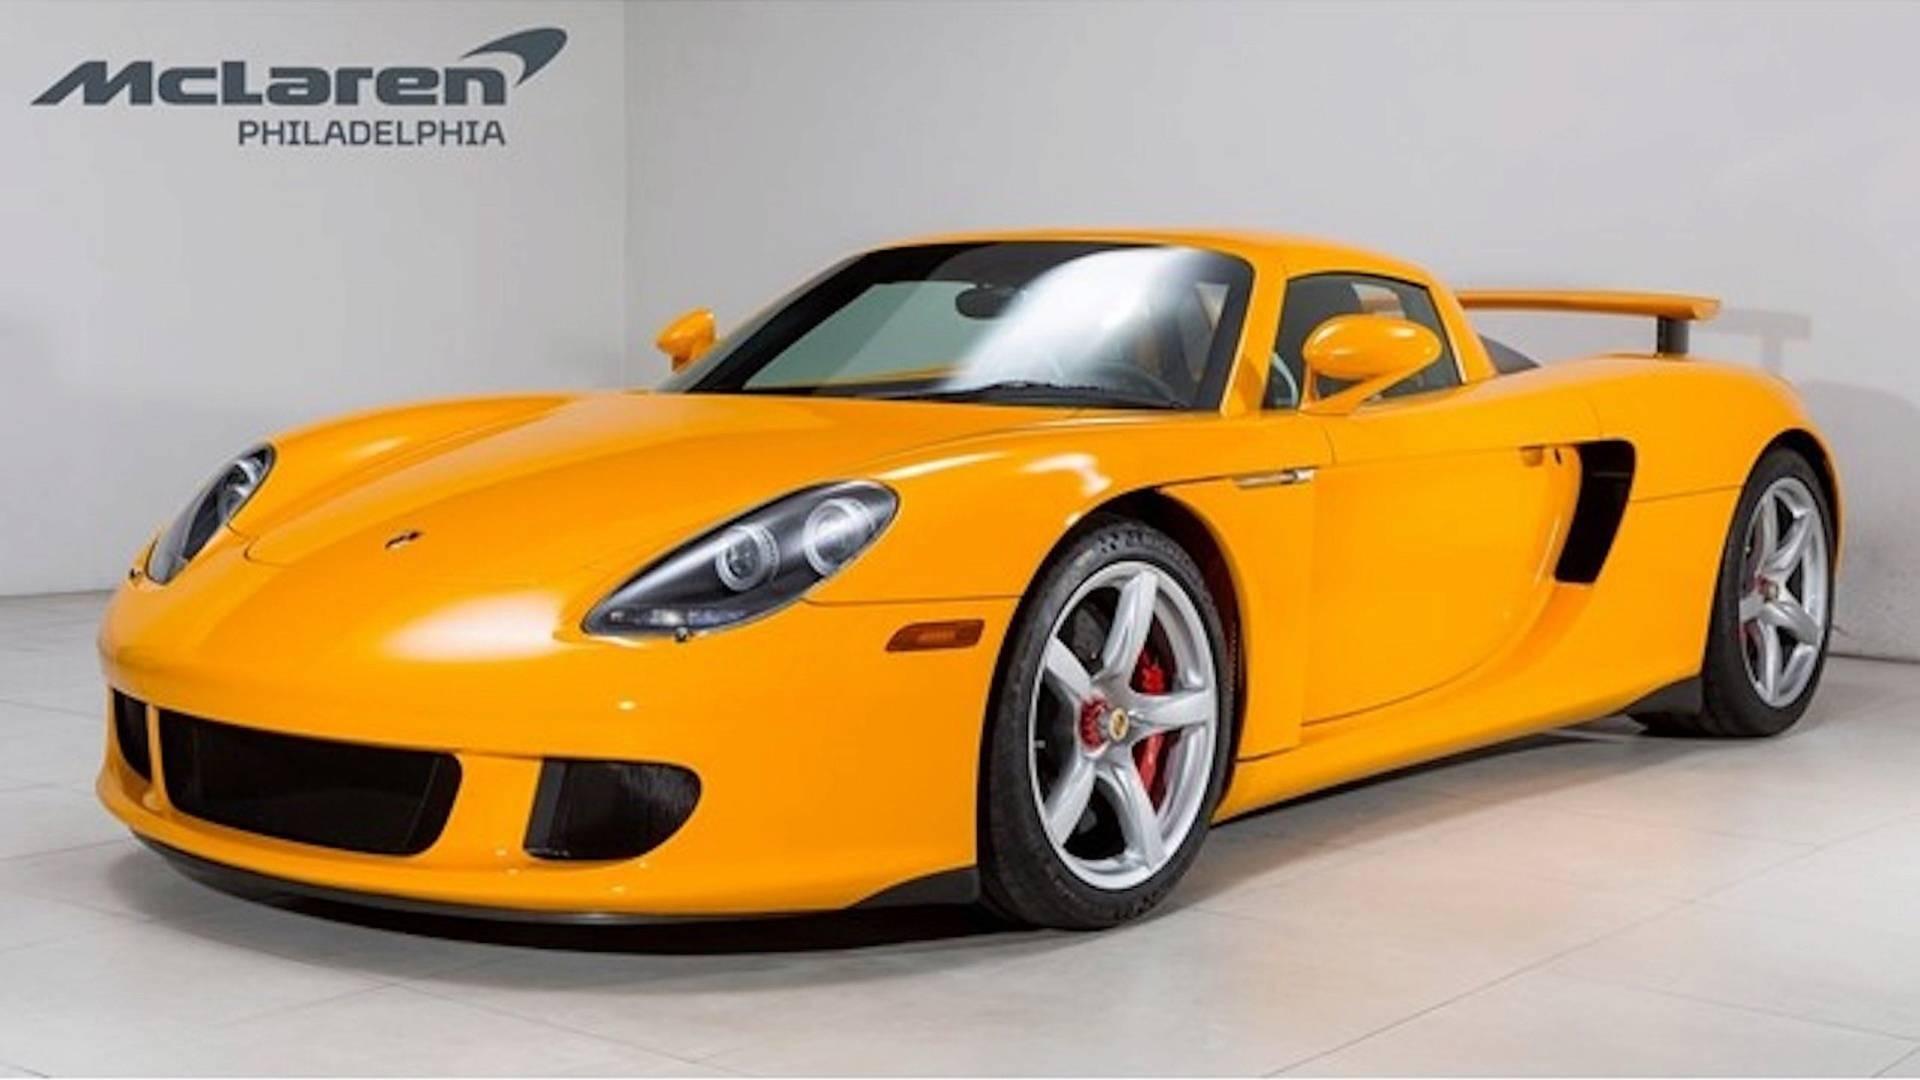 Unique Porsche Carrera Gt Signal Yellow Demands 124 Million